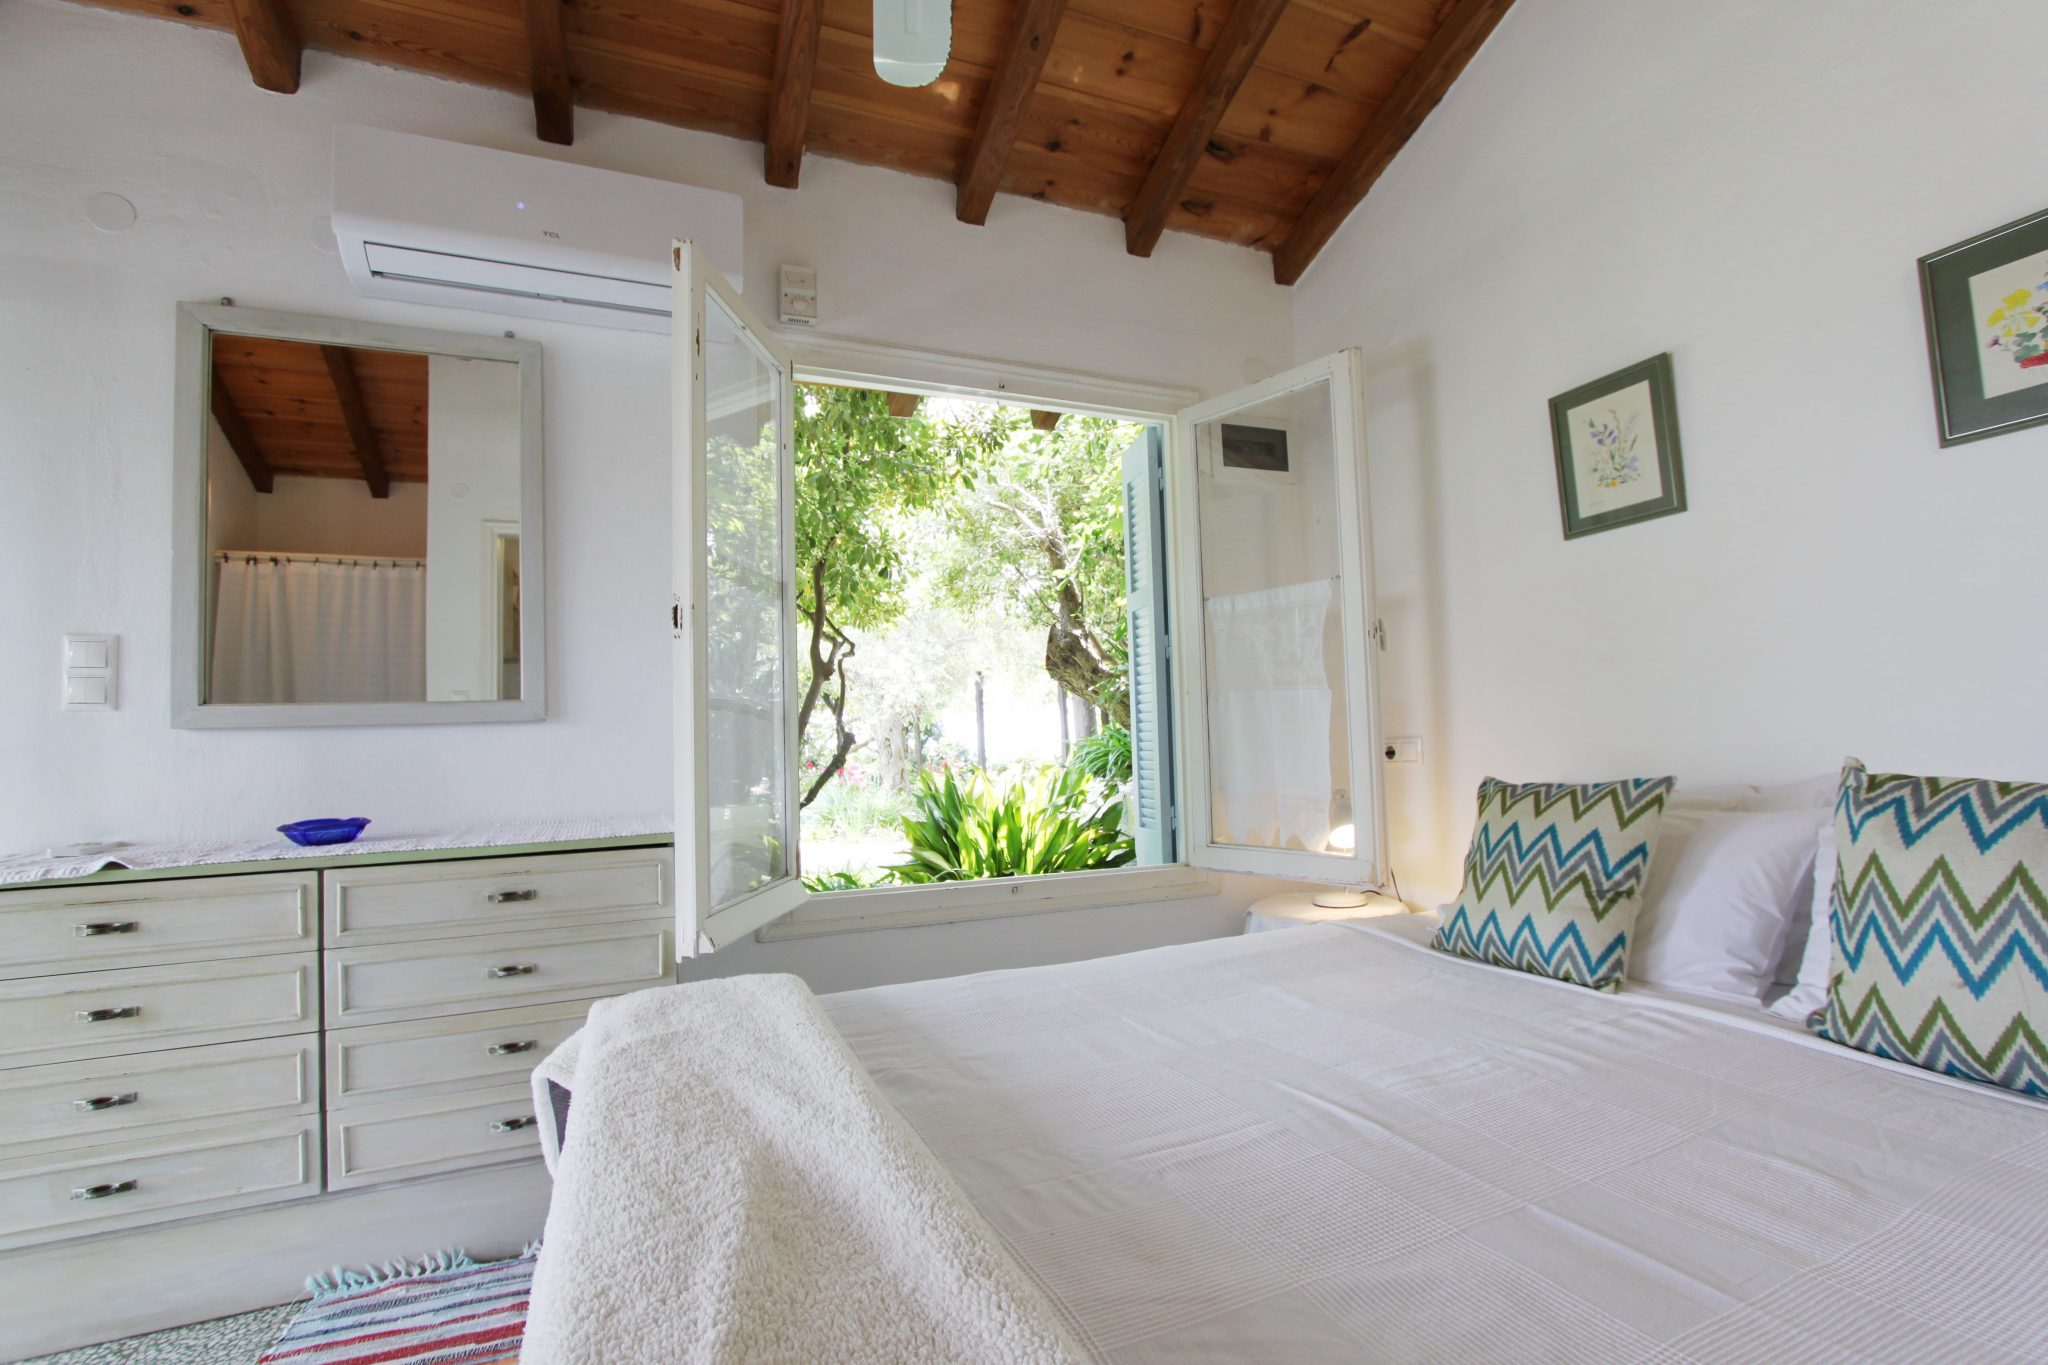 Pinetree bedroom 4